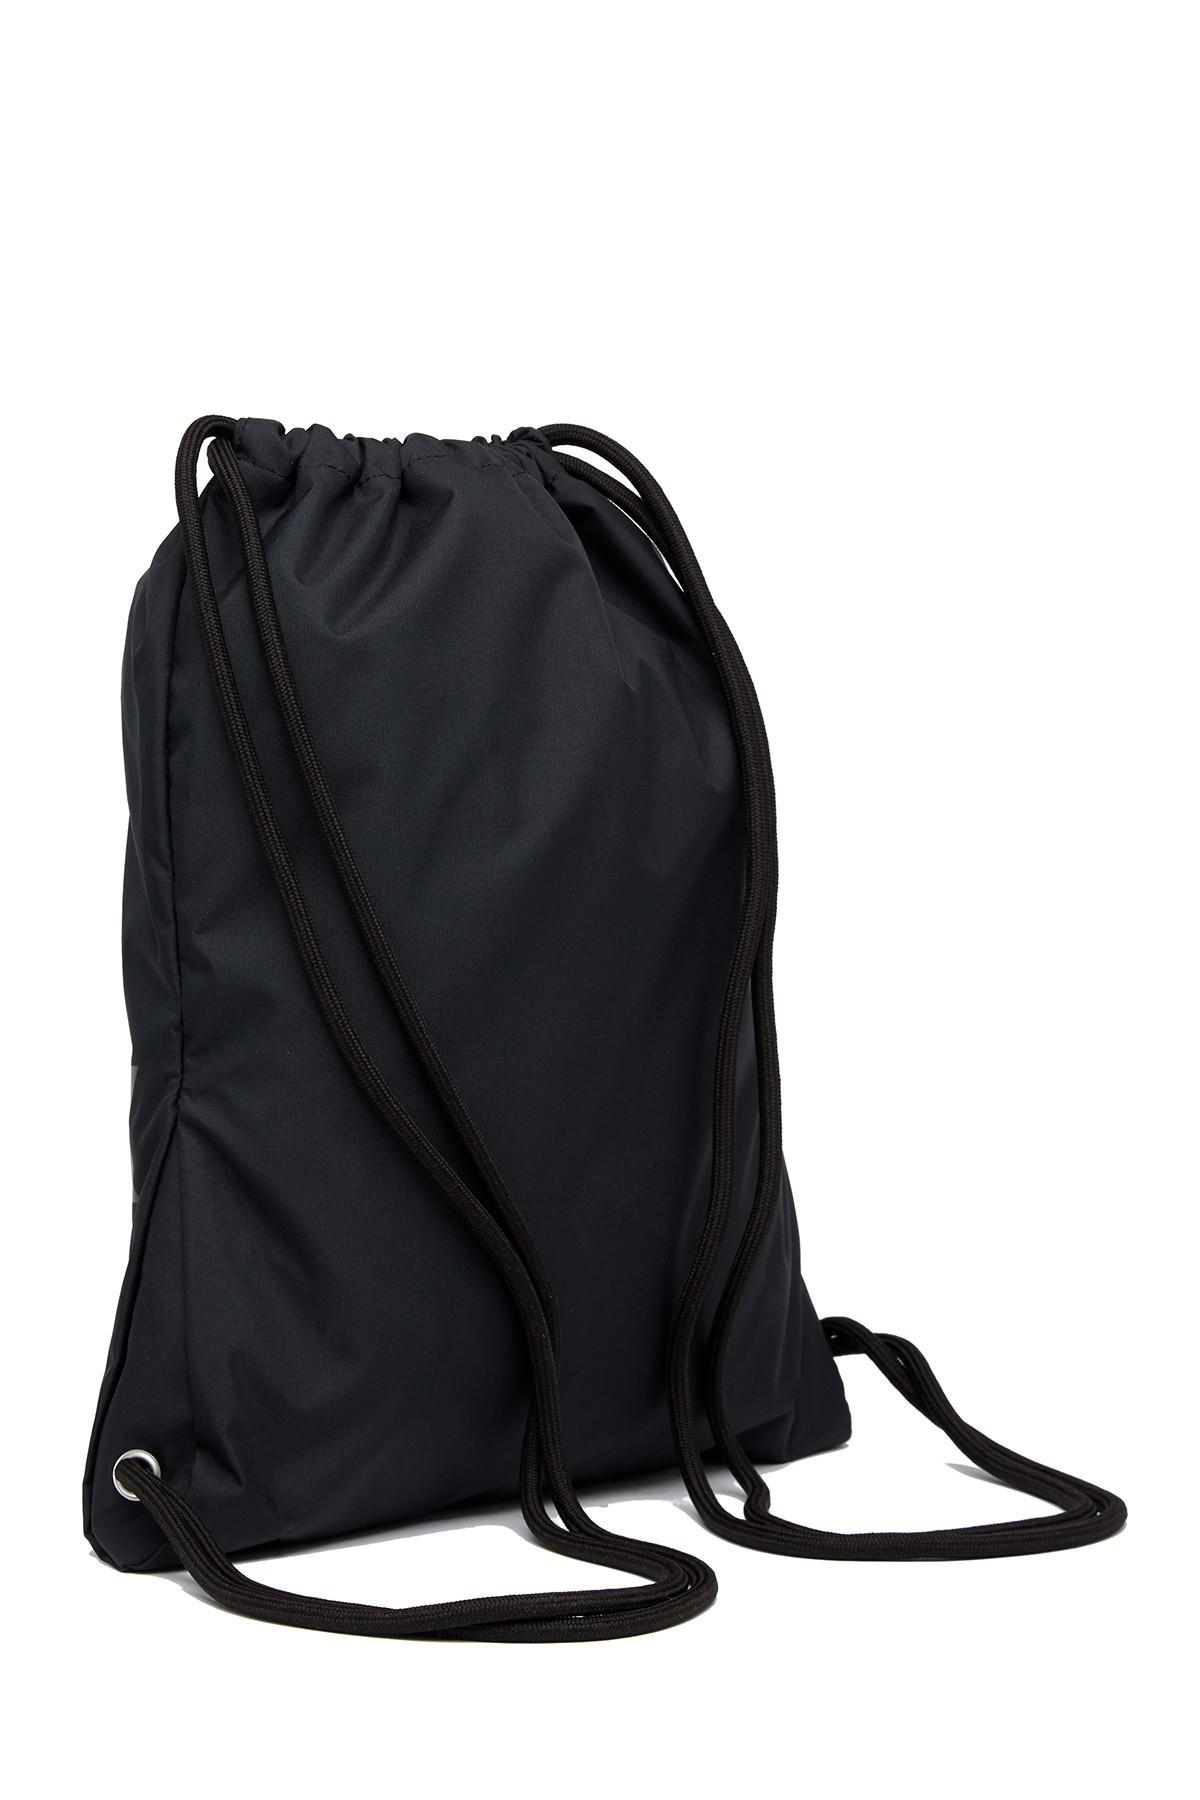 debcc0801bd1 Lyst - Nike Heritage Gymsak 2 Drawstring Backpack in Black